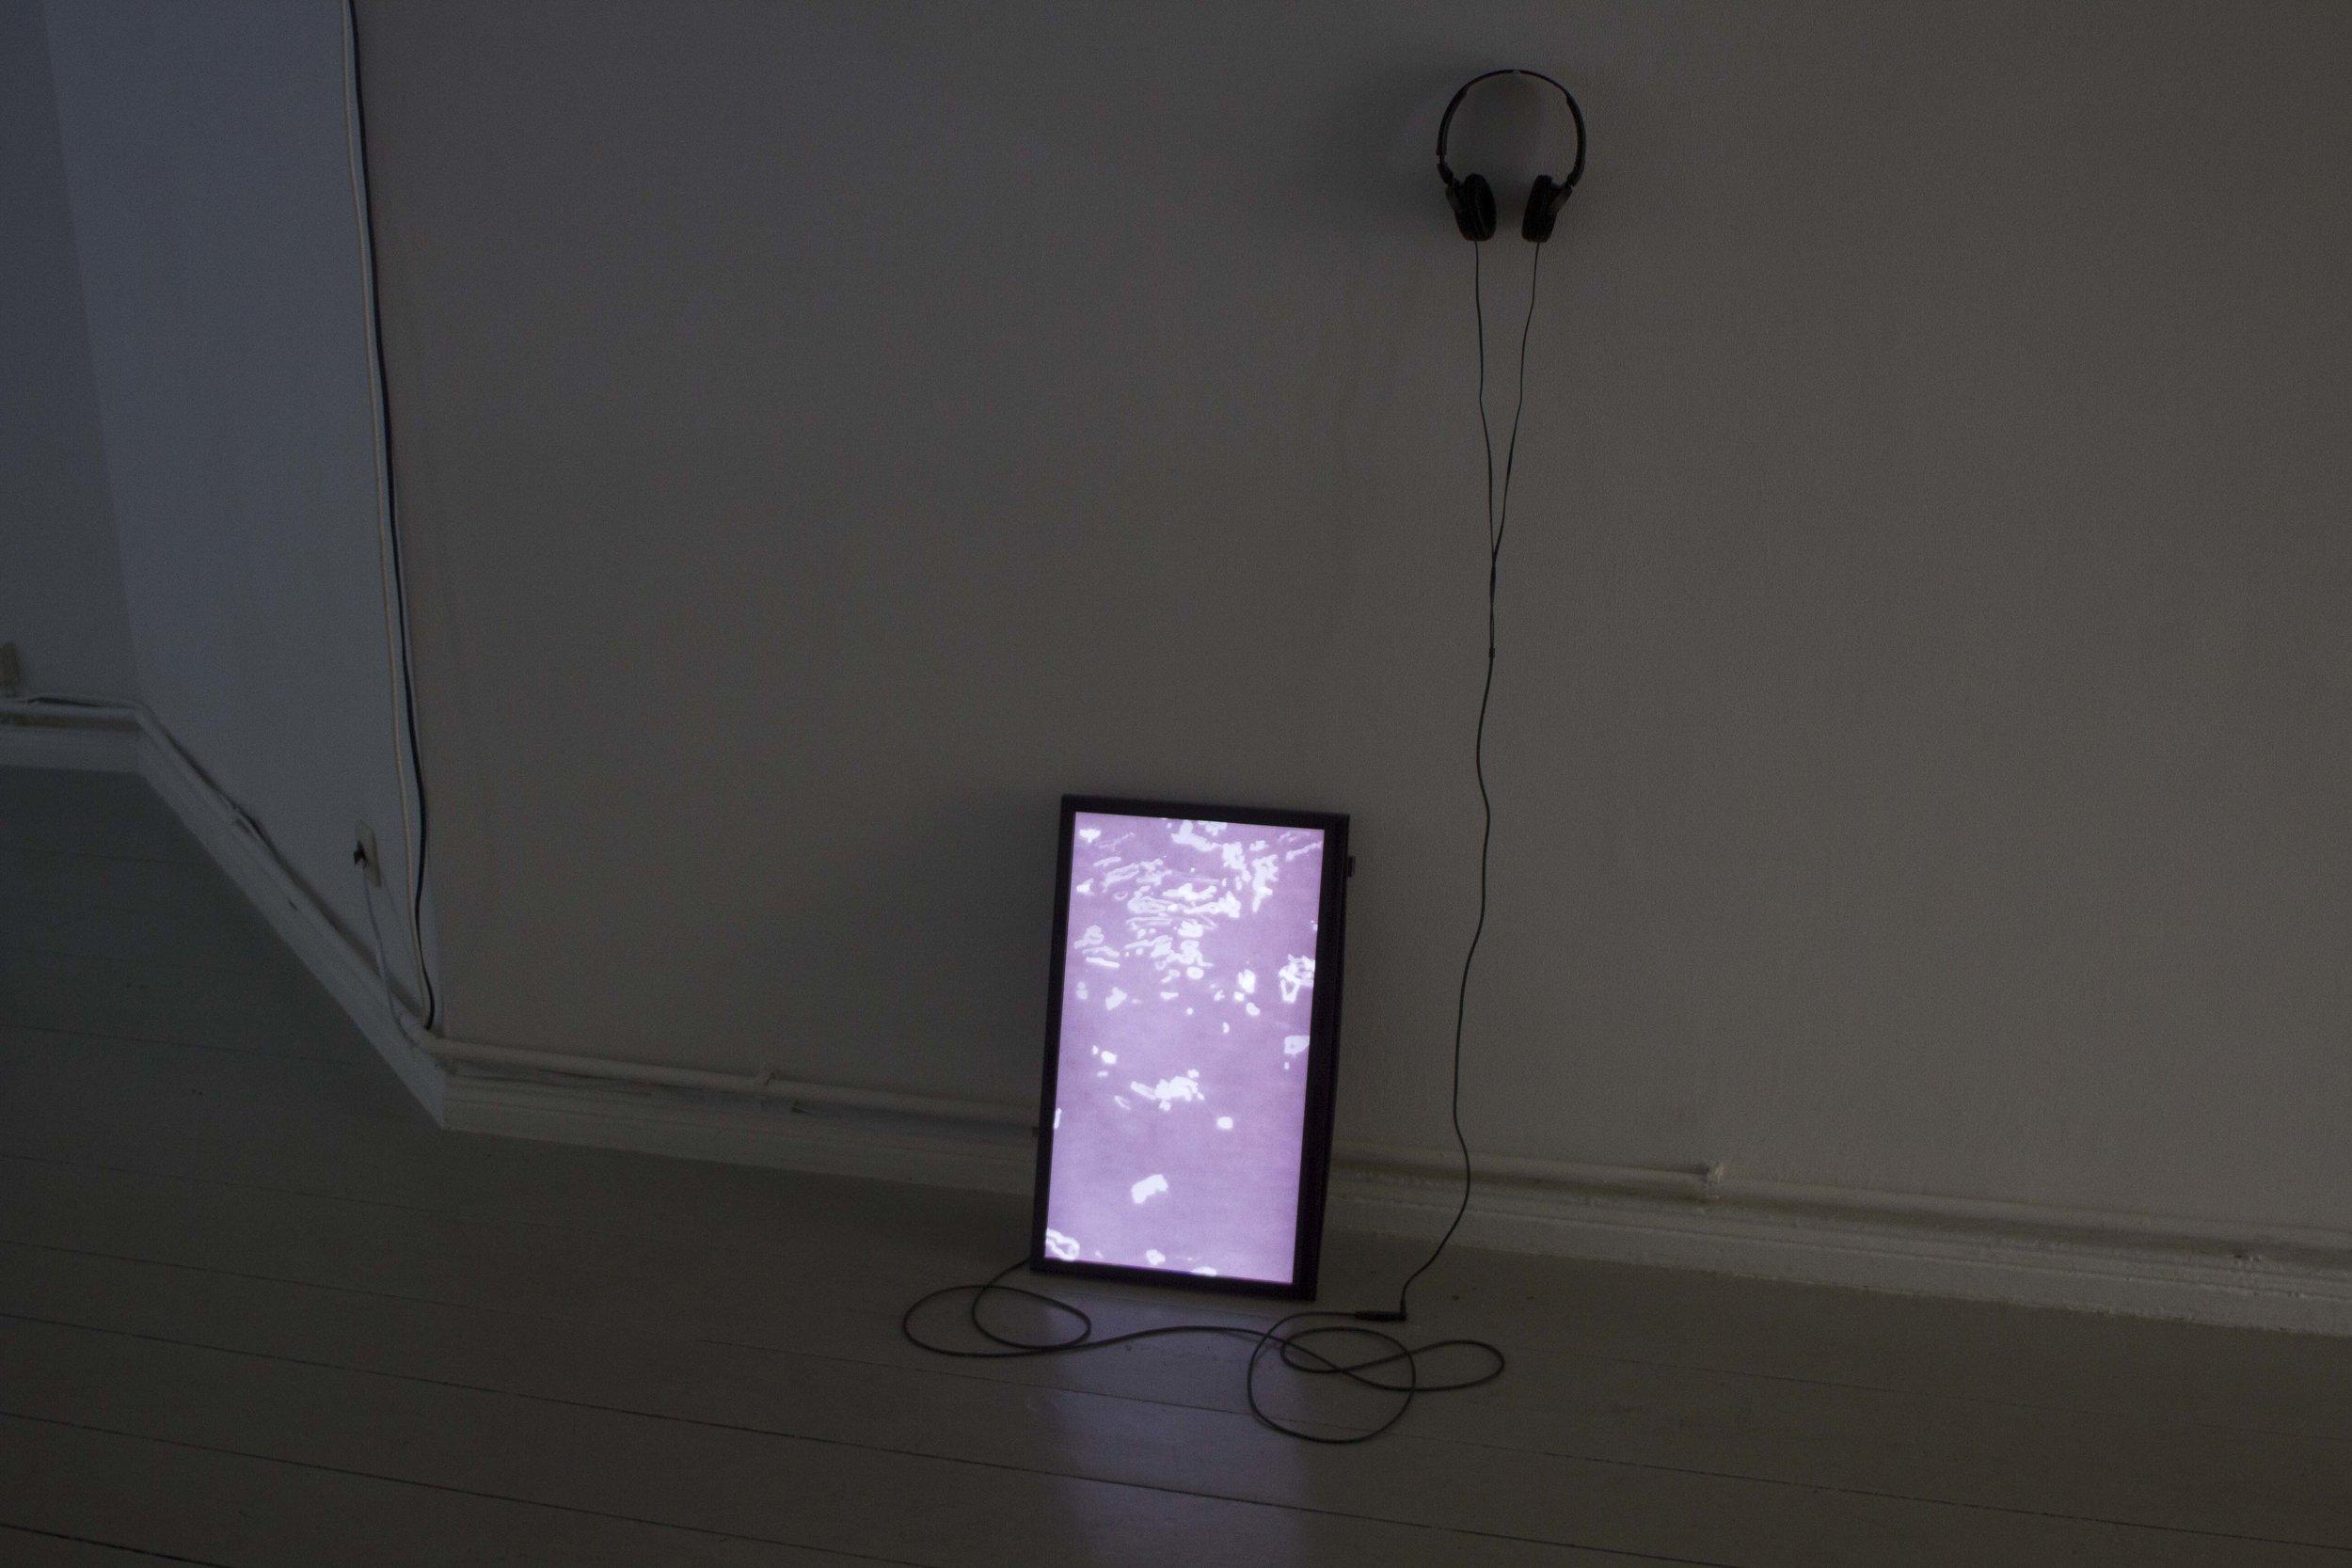 Hilbert_installation_3.jpg